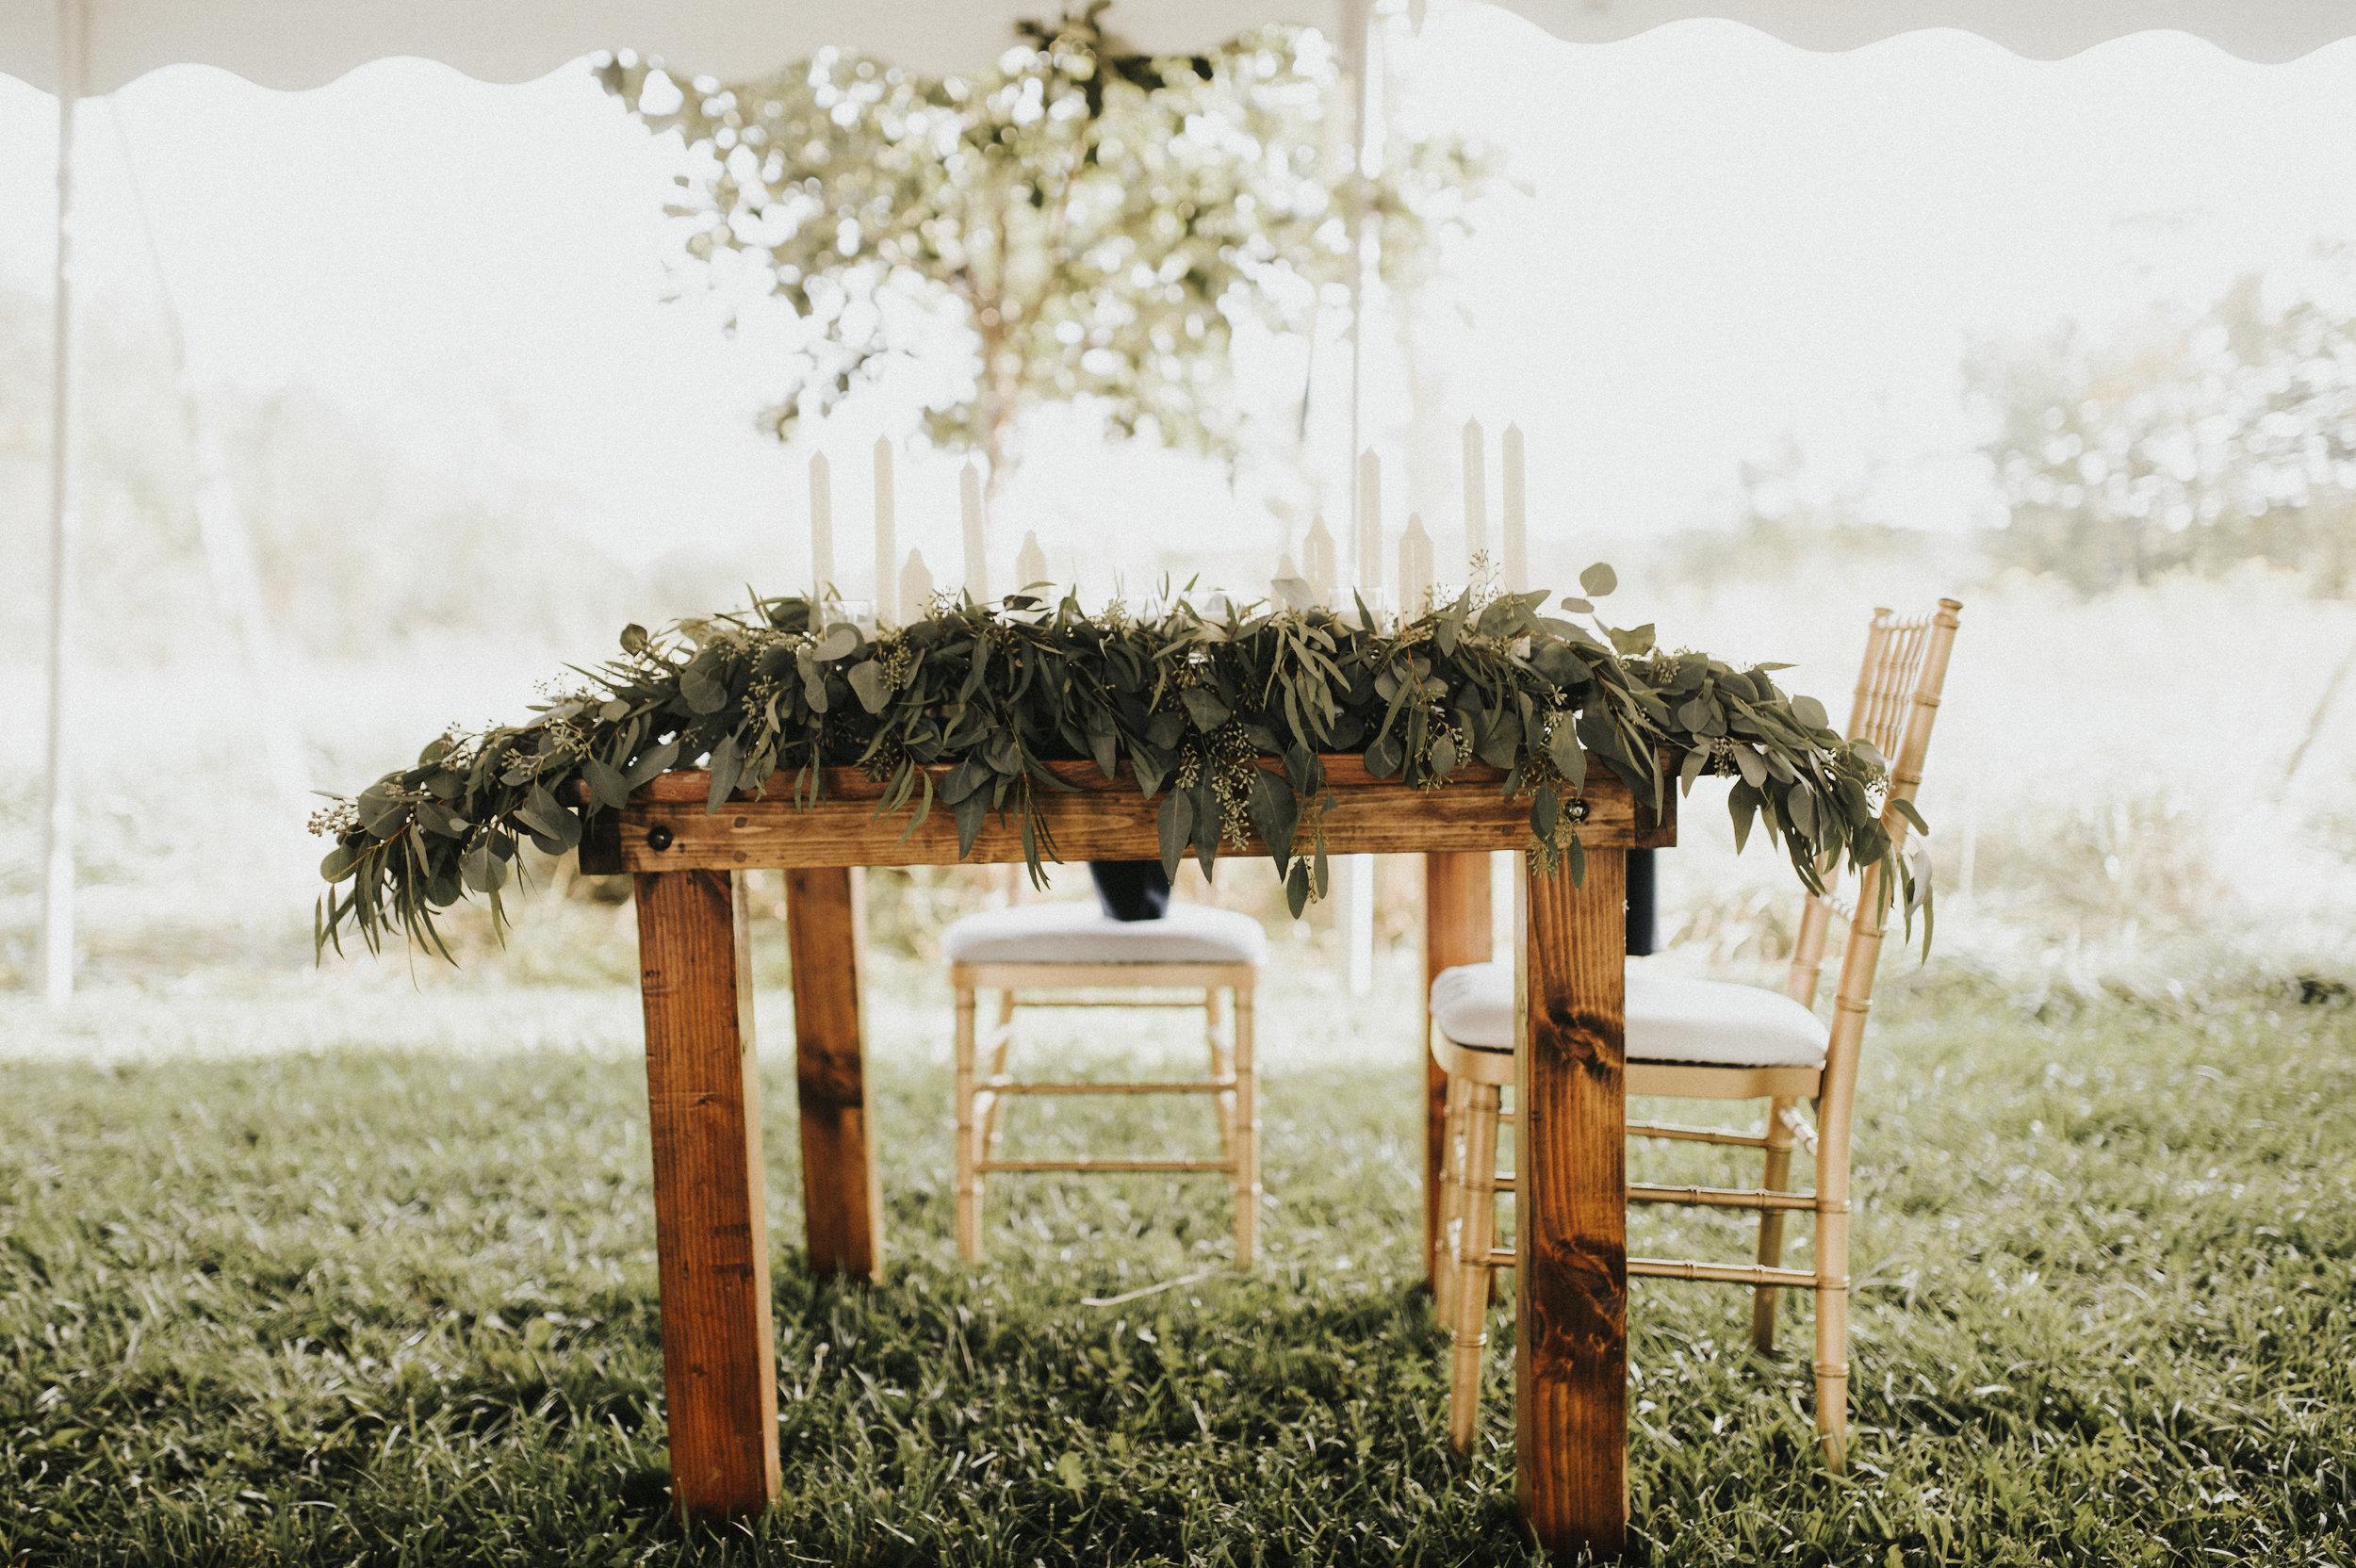 The Black Tie Bride - Romantic Black Tie Wedding in New York by Rachel Liz PhotographyApril 9, 2018